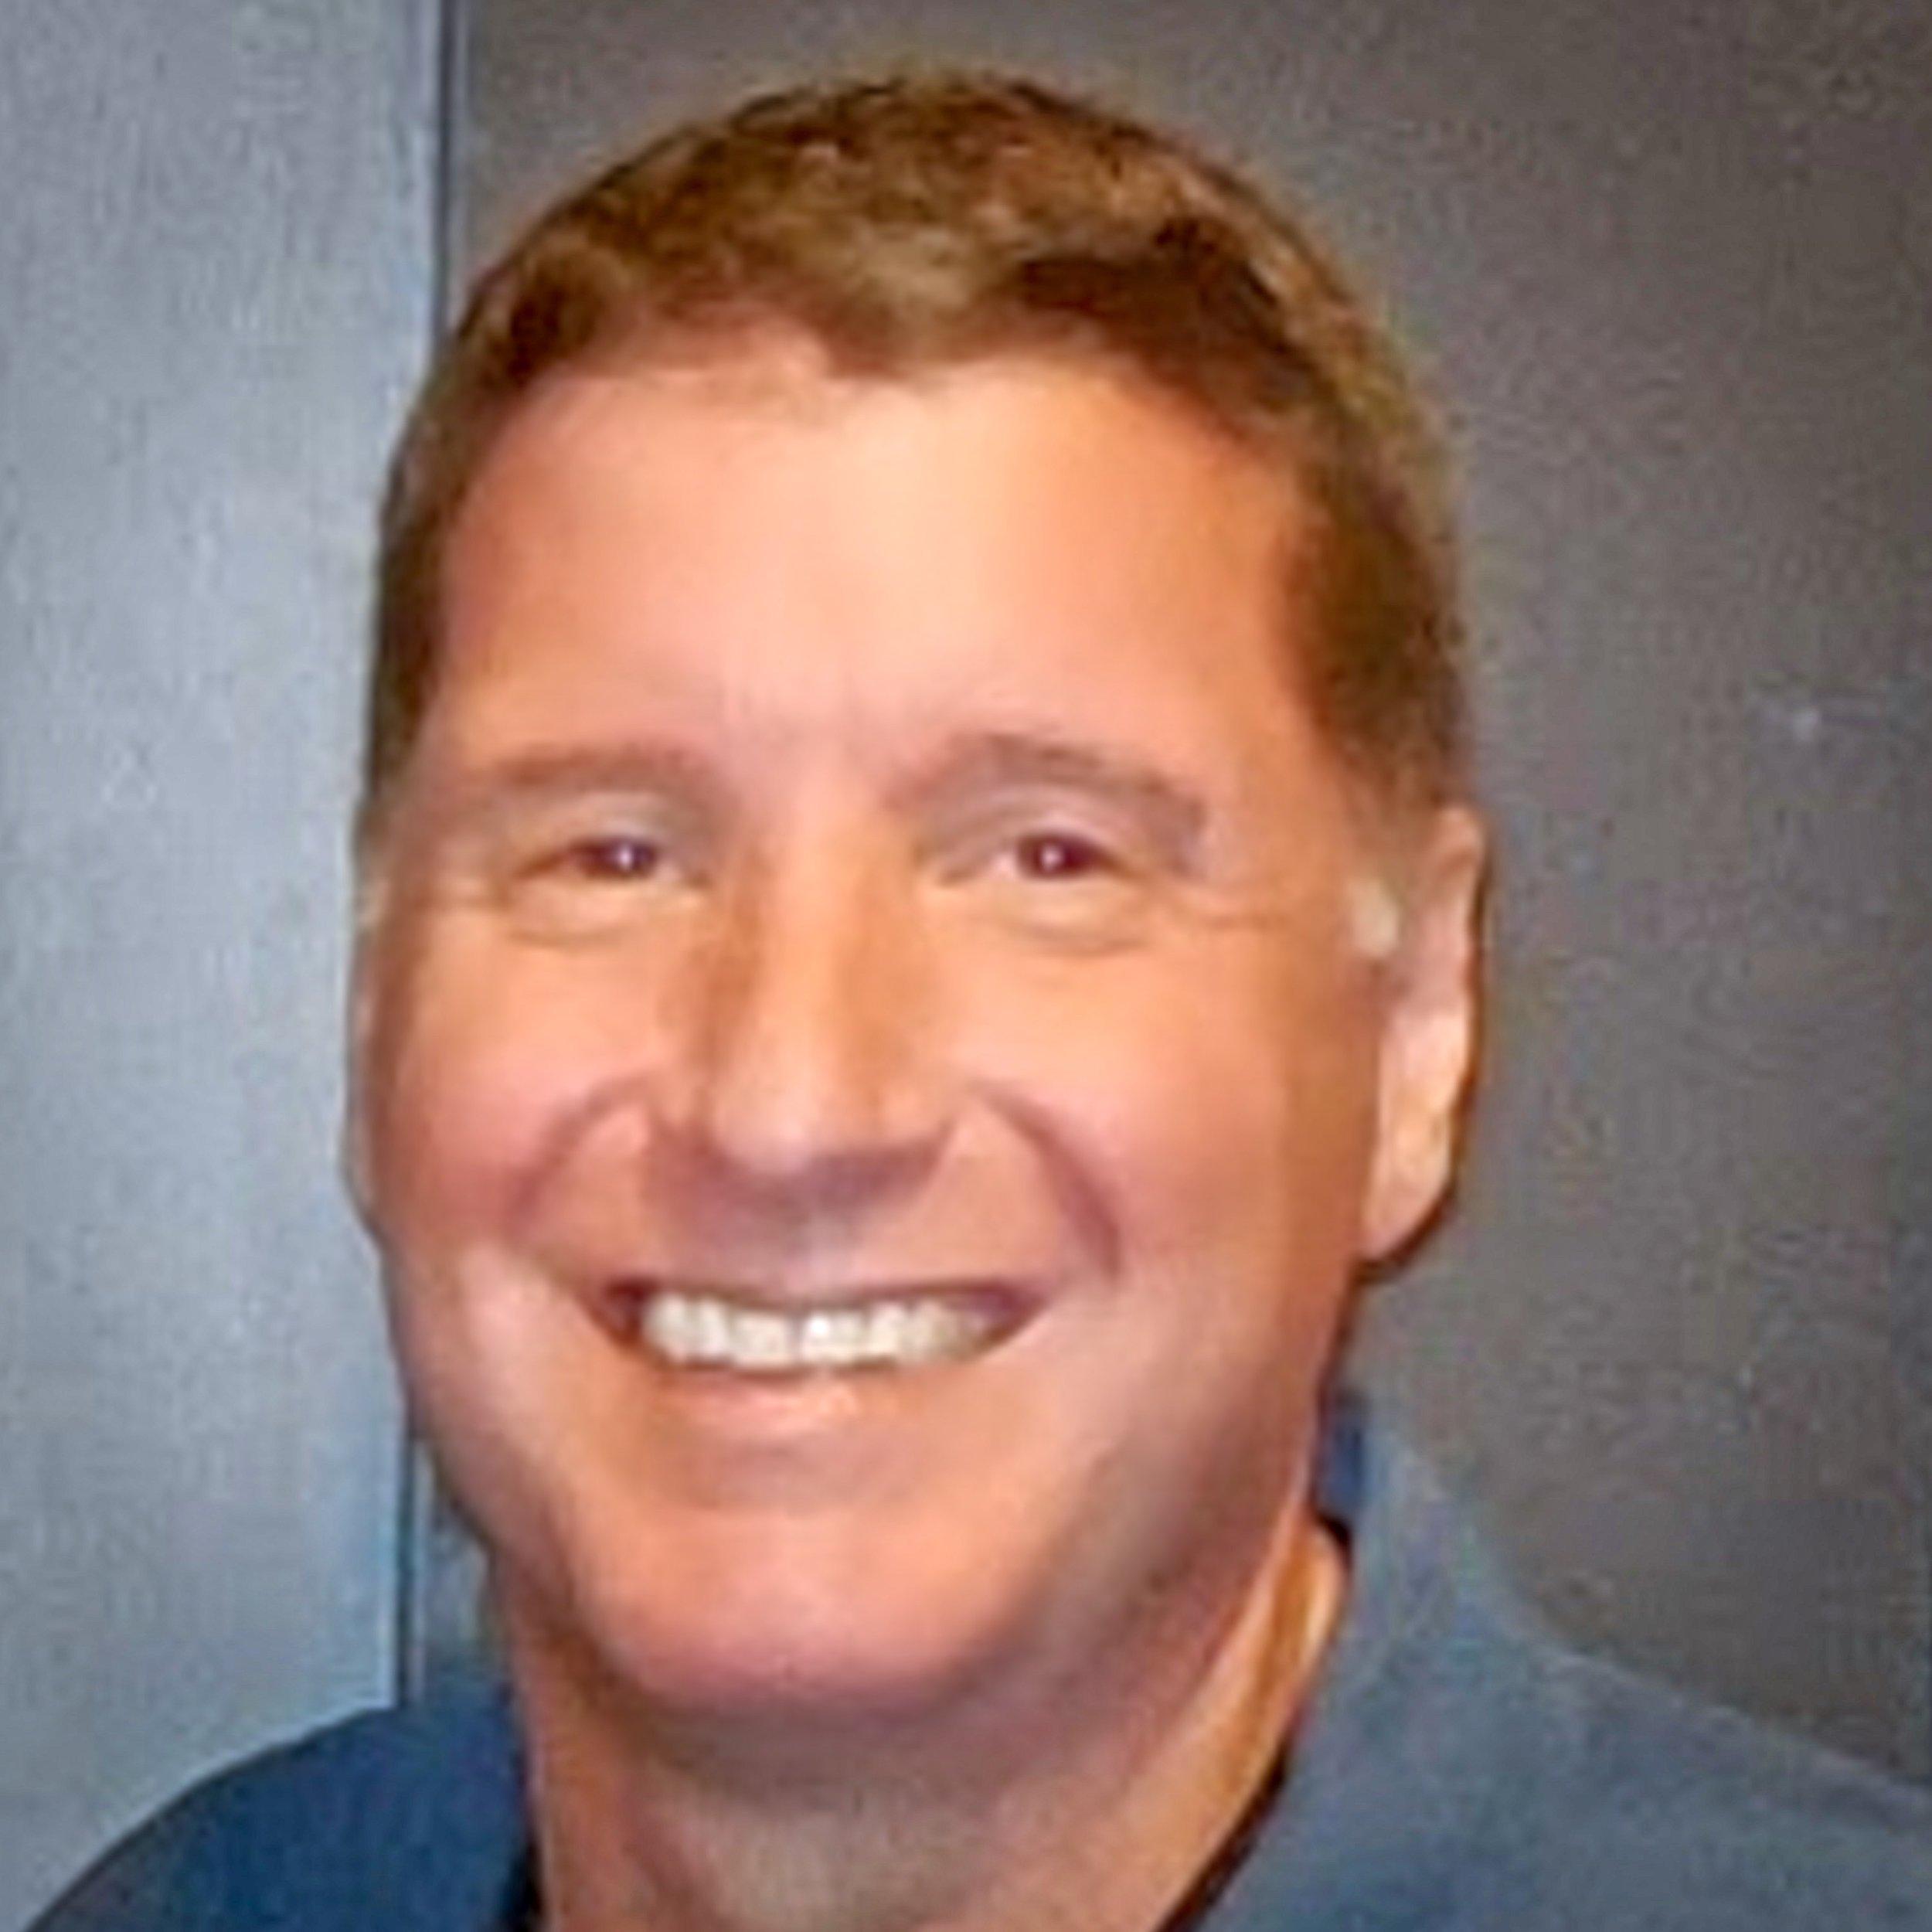 "<i> Scott DeFusco</i><br><a href=""https://capturelife.com"" target=""_blank""><b>CaptureLife</b></a>"